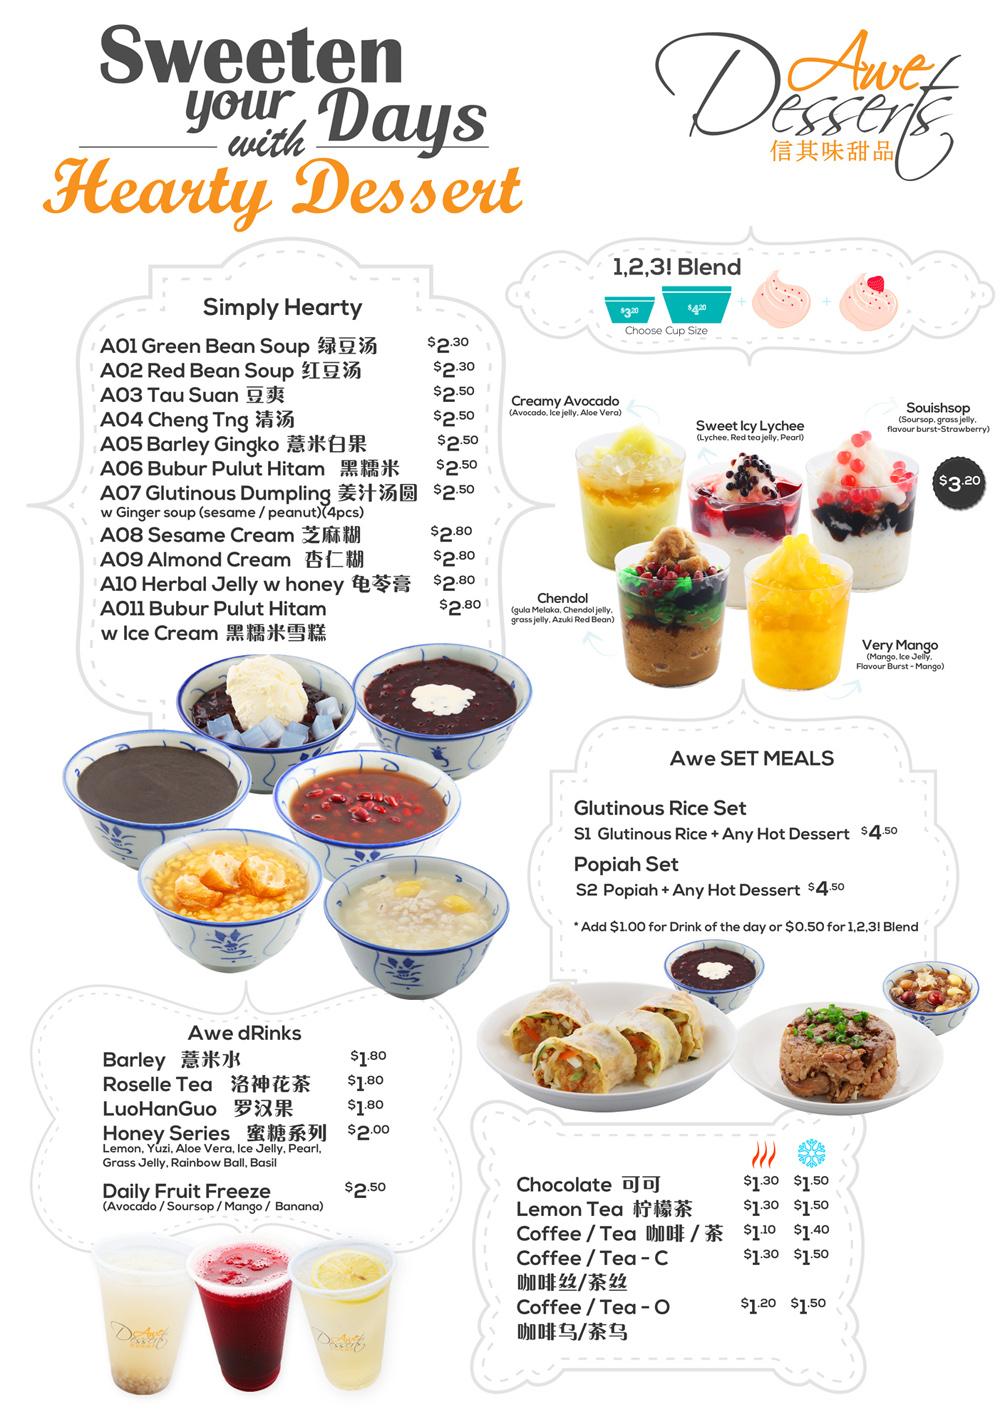 Awe Desserts Glass Sticker by Phocept